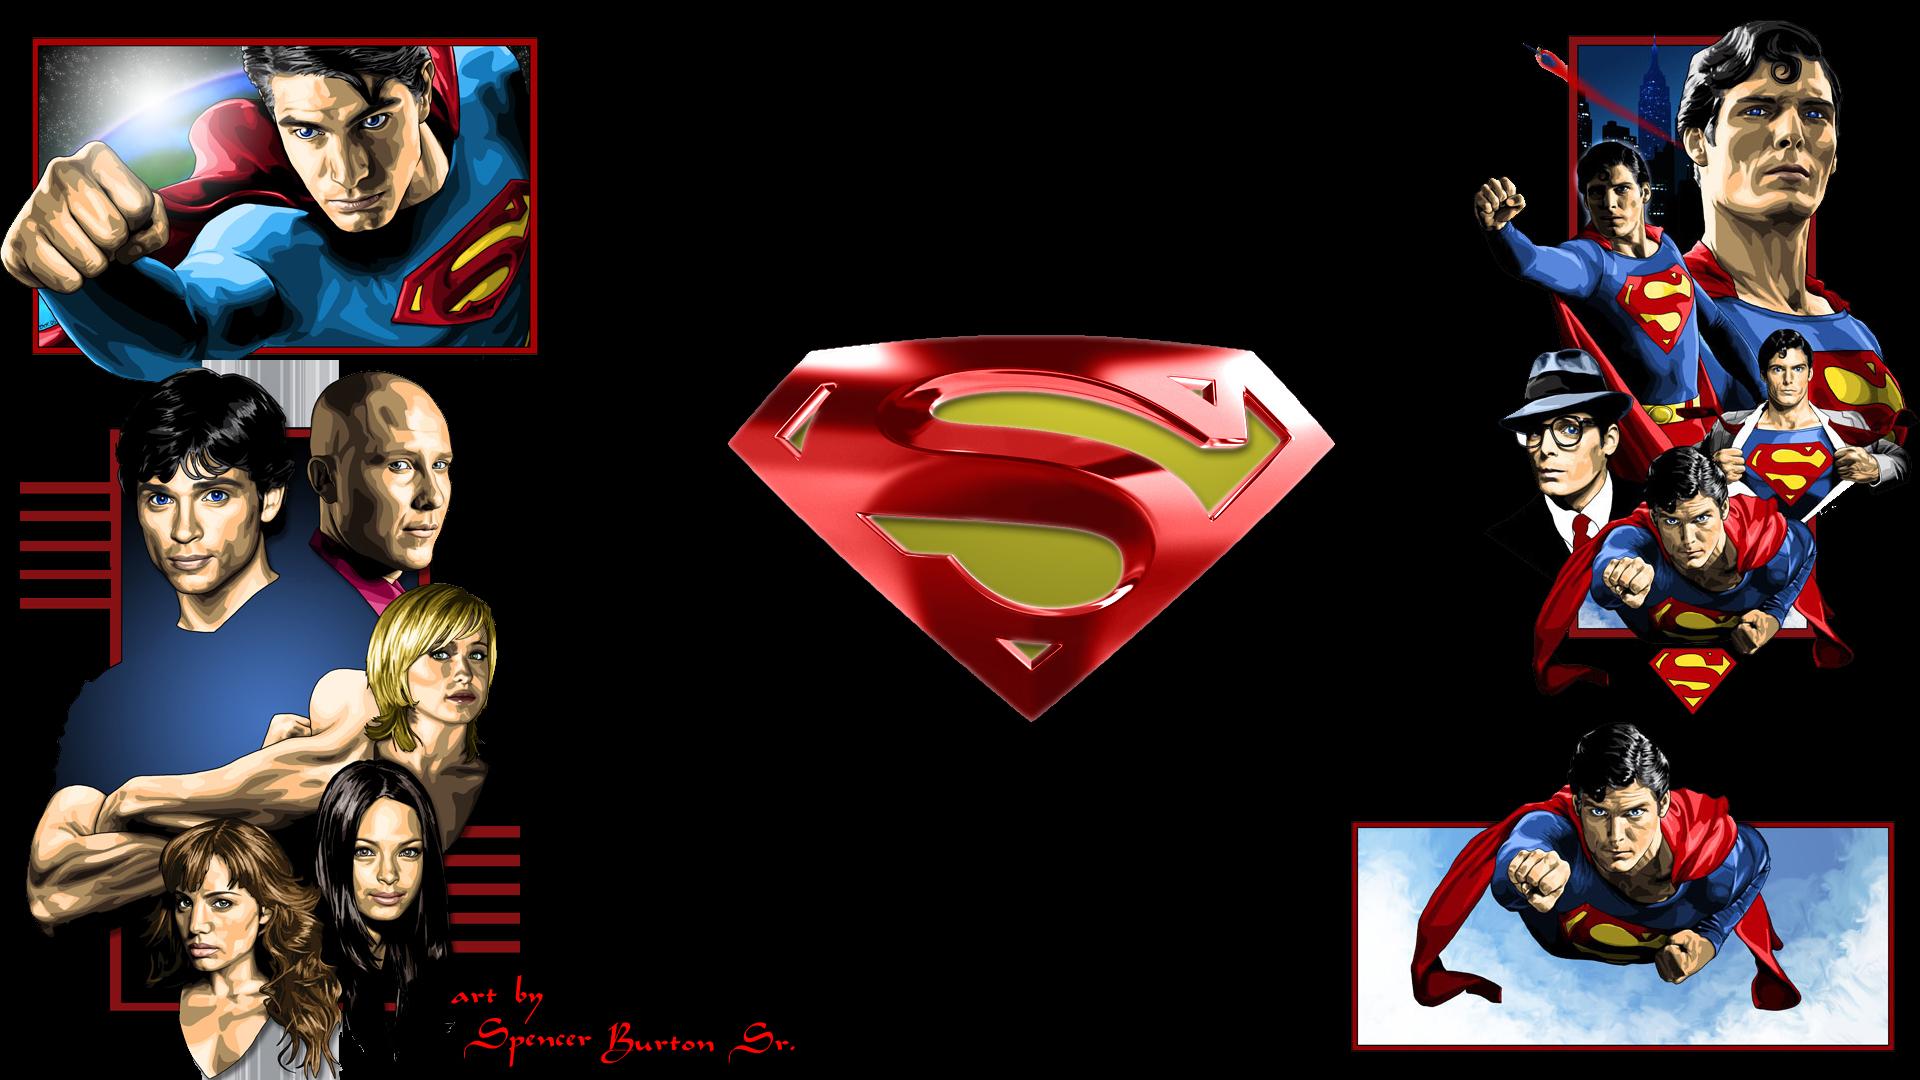 wallpaper widescreen screensavers superman 1920x1080 1920x1080